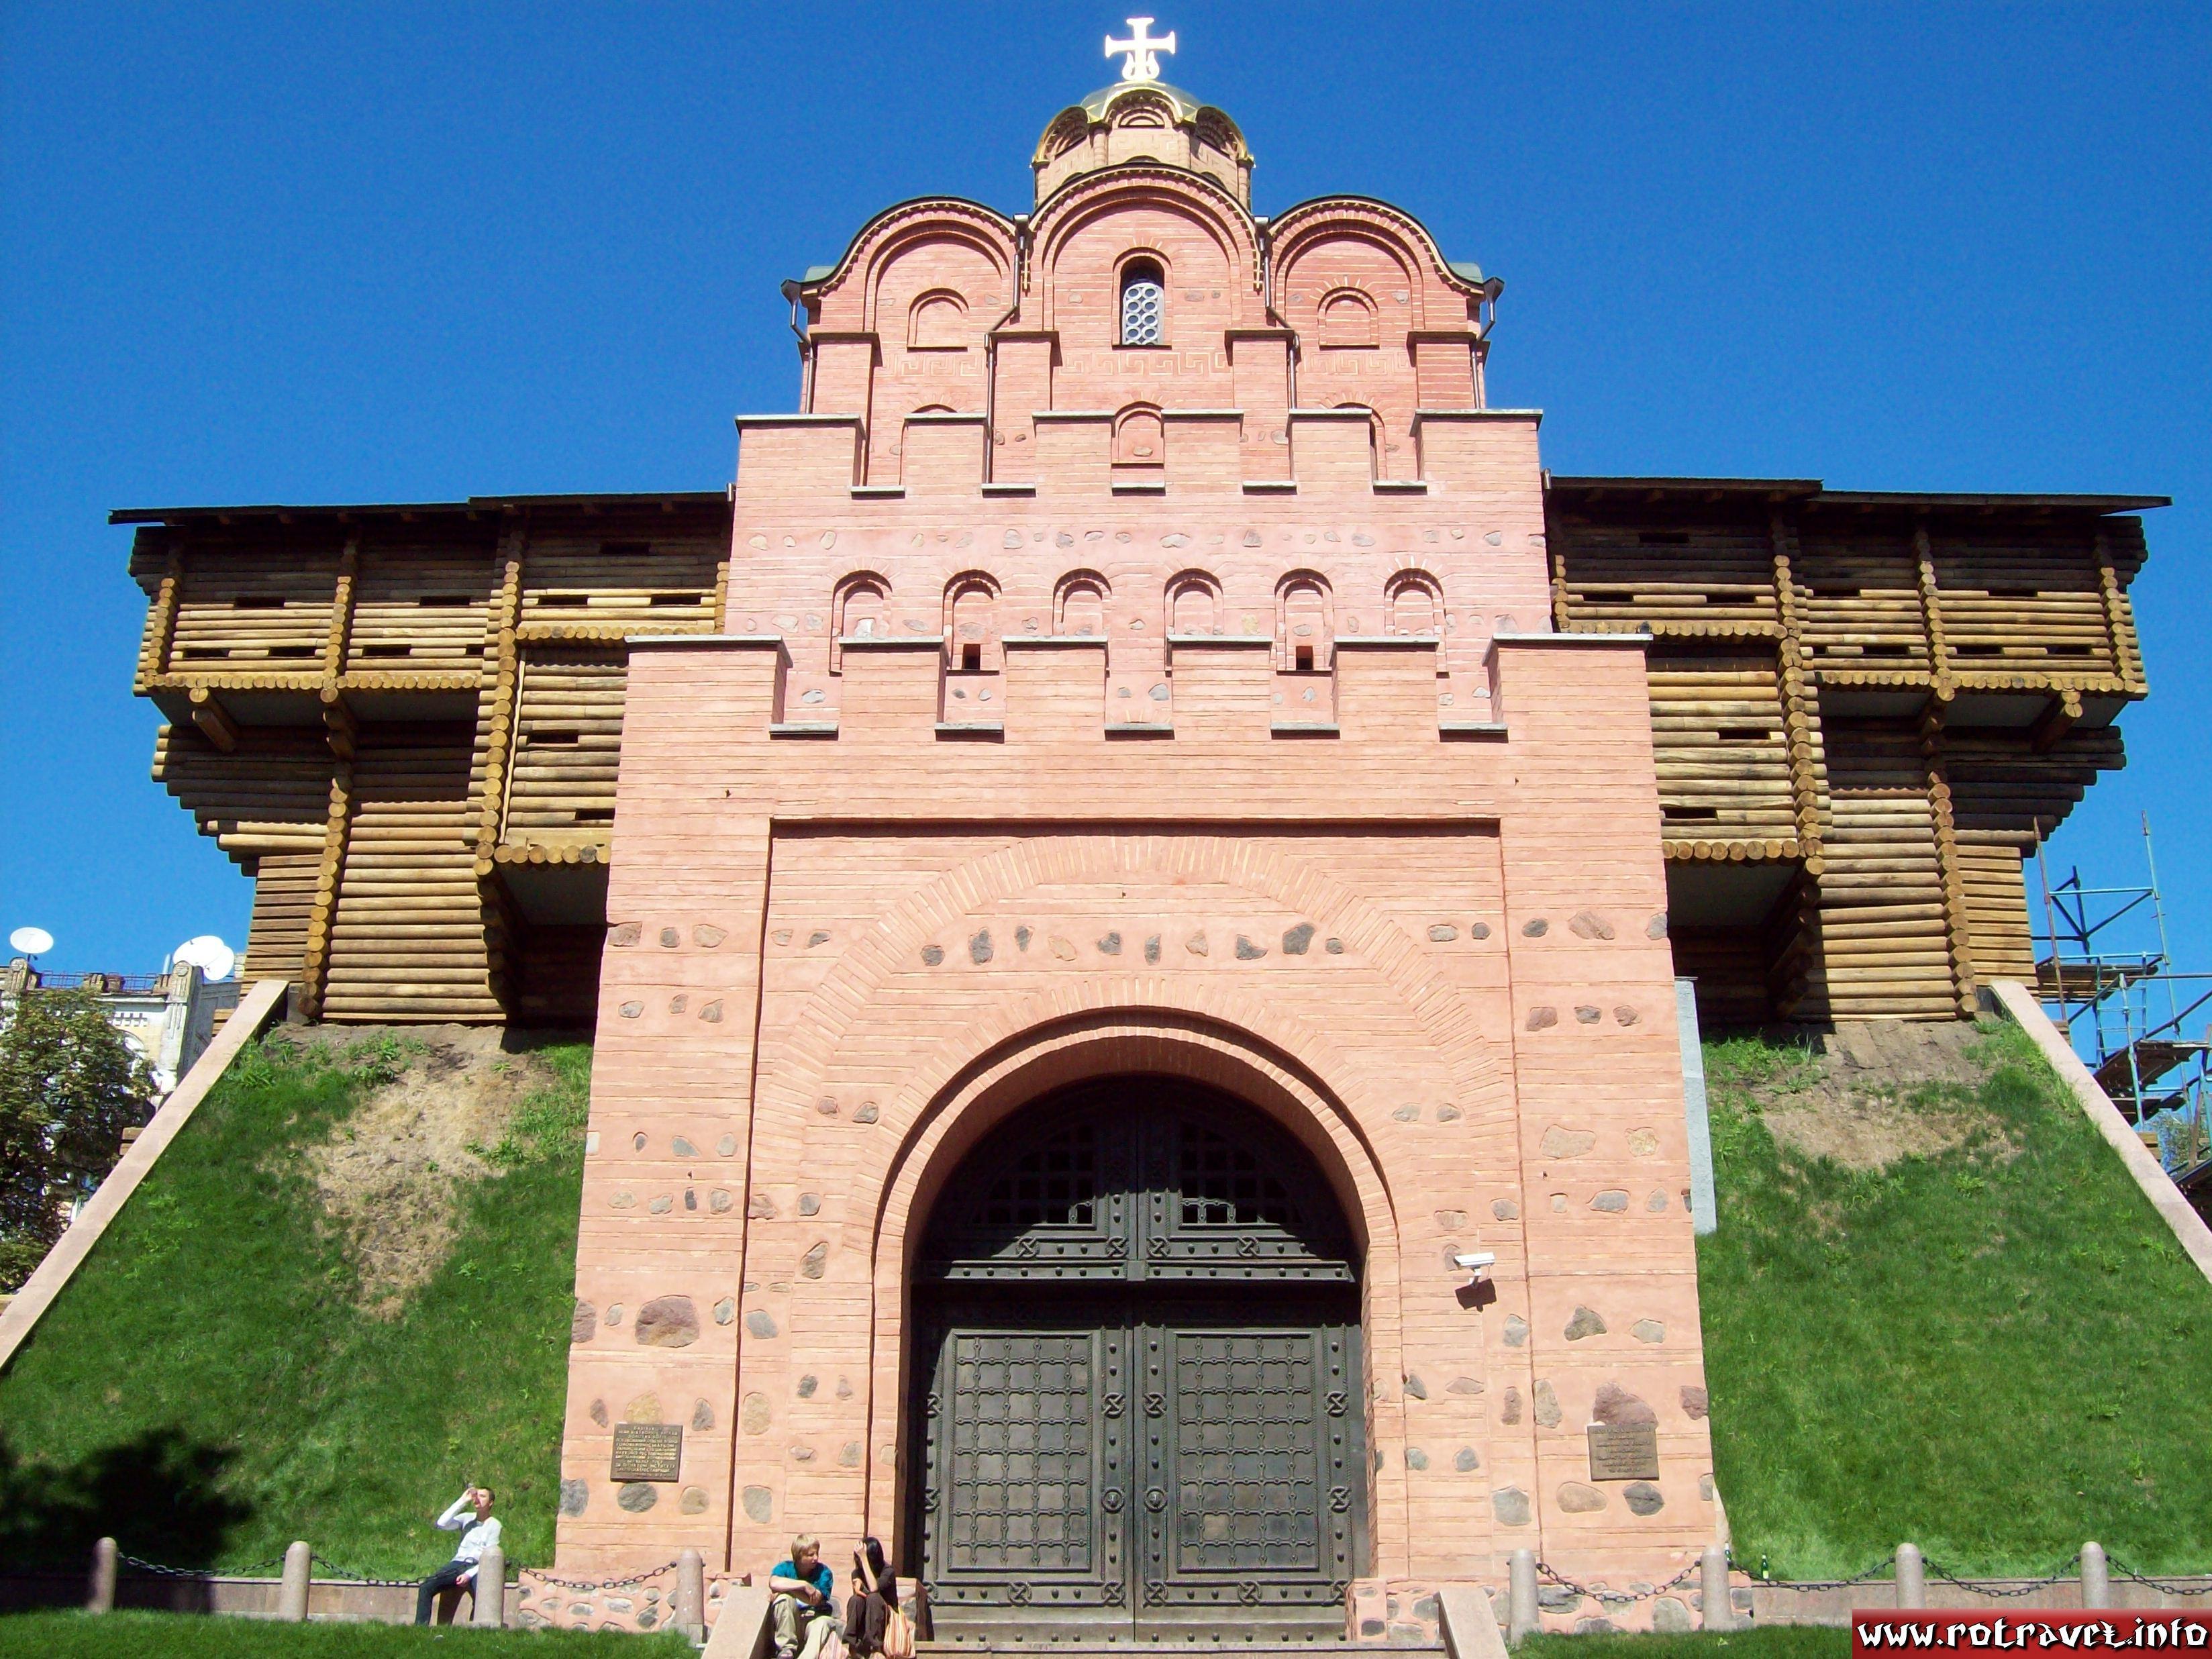 The Golden Gate of Kiev (Ukrainian: Золоті ворота, Zoloti vorota) constructed by Yaroslav the Wise (c. 978 in Kiev - February 20, 1054 in Kiev)